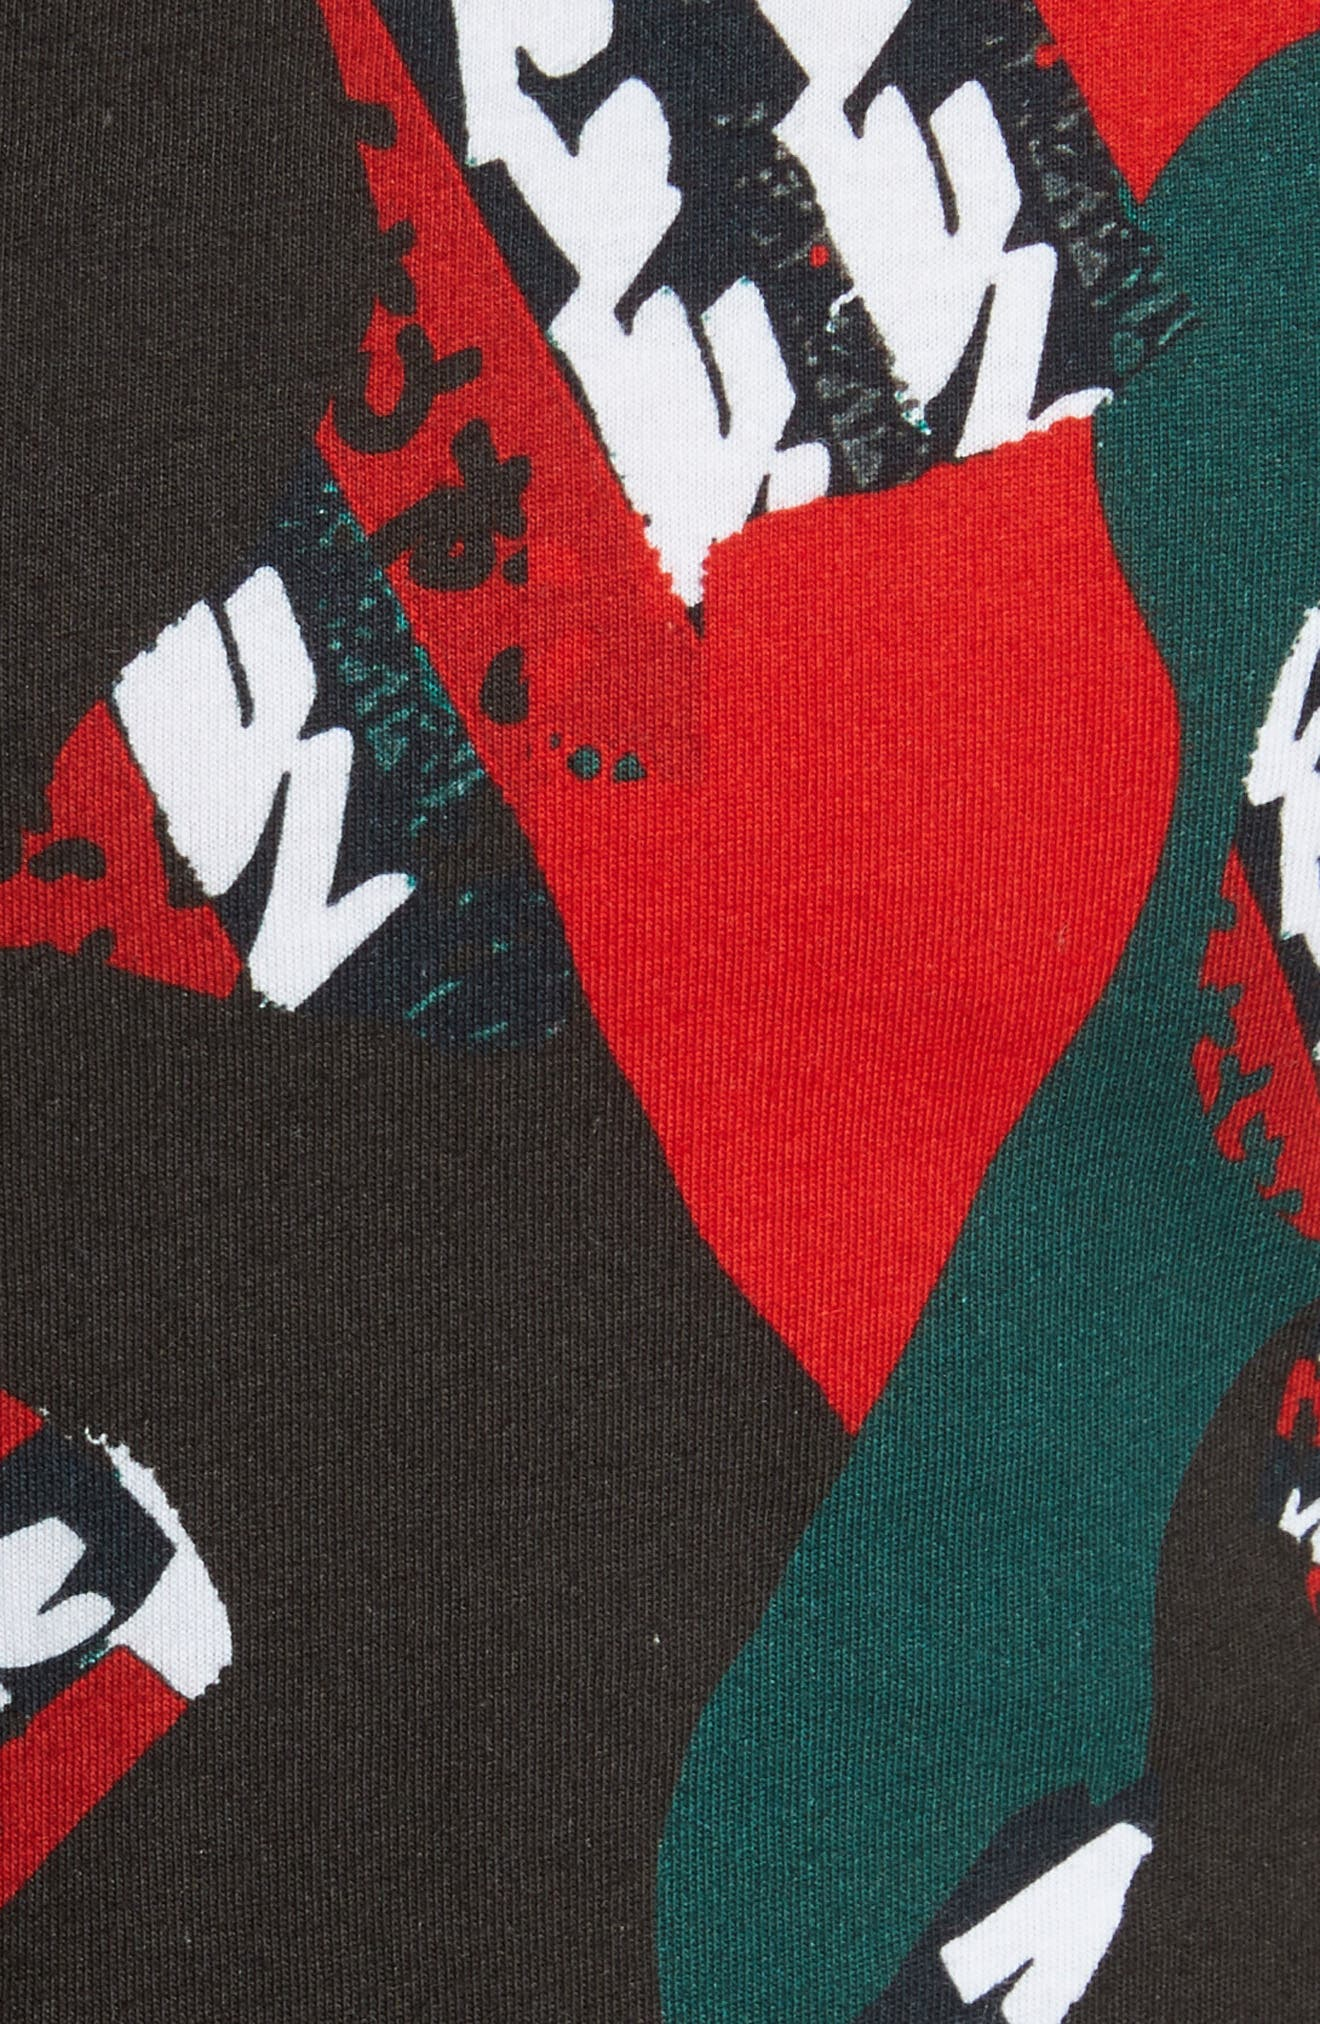 VERSUS by Versace Camo T-Shirt,                             Alternate thumbnail 5, color,                             626